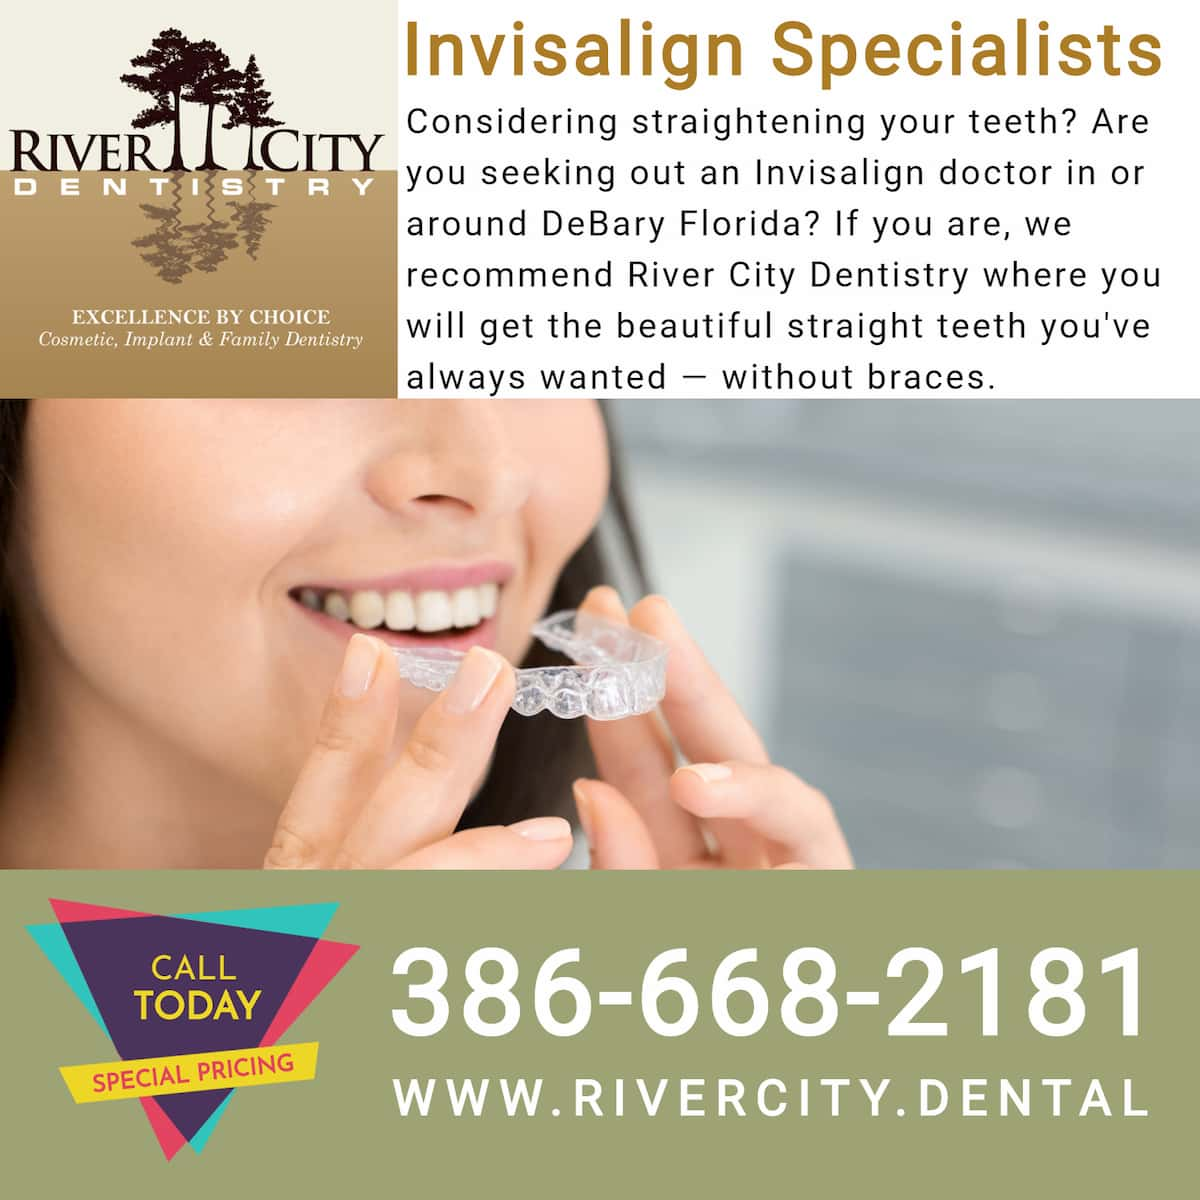 Invisalign Provider - River City Dentistry DeBary FL